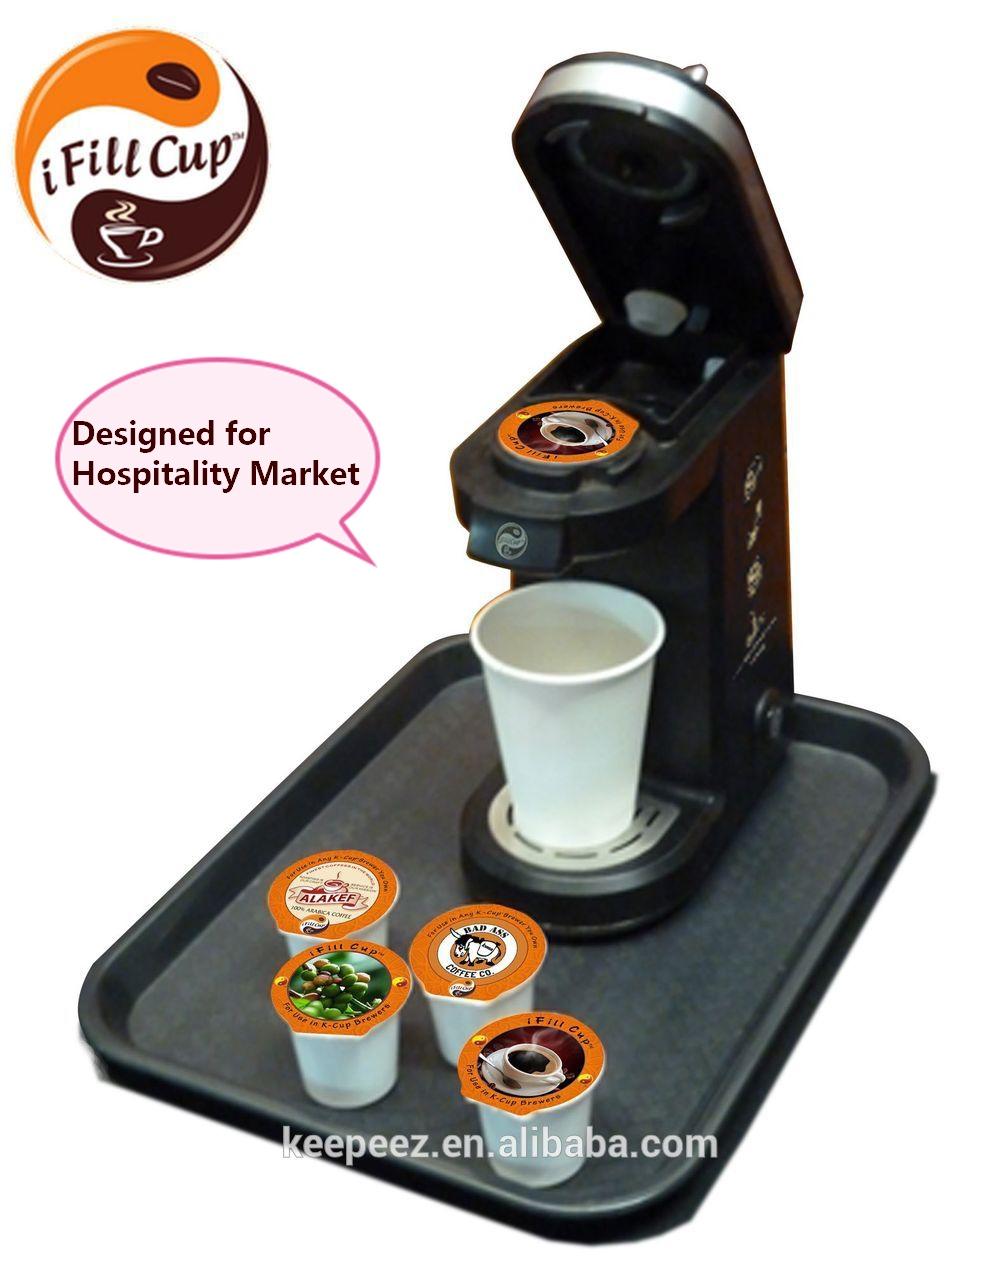 Ul Approved In Room Coffee Machine Hospitality Keurig K Cup Coffee